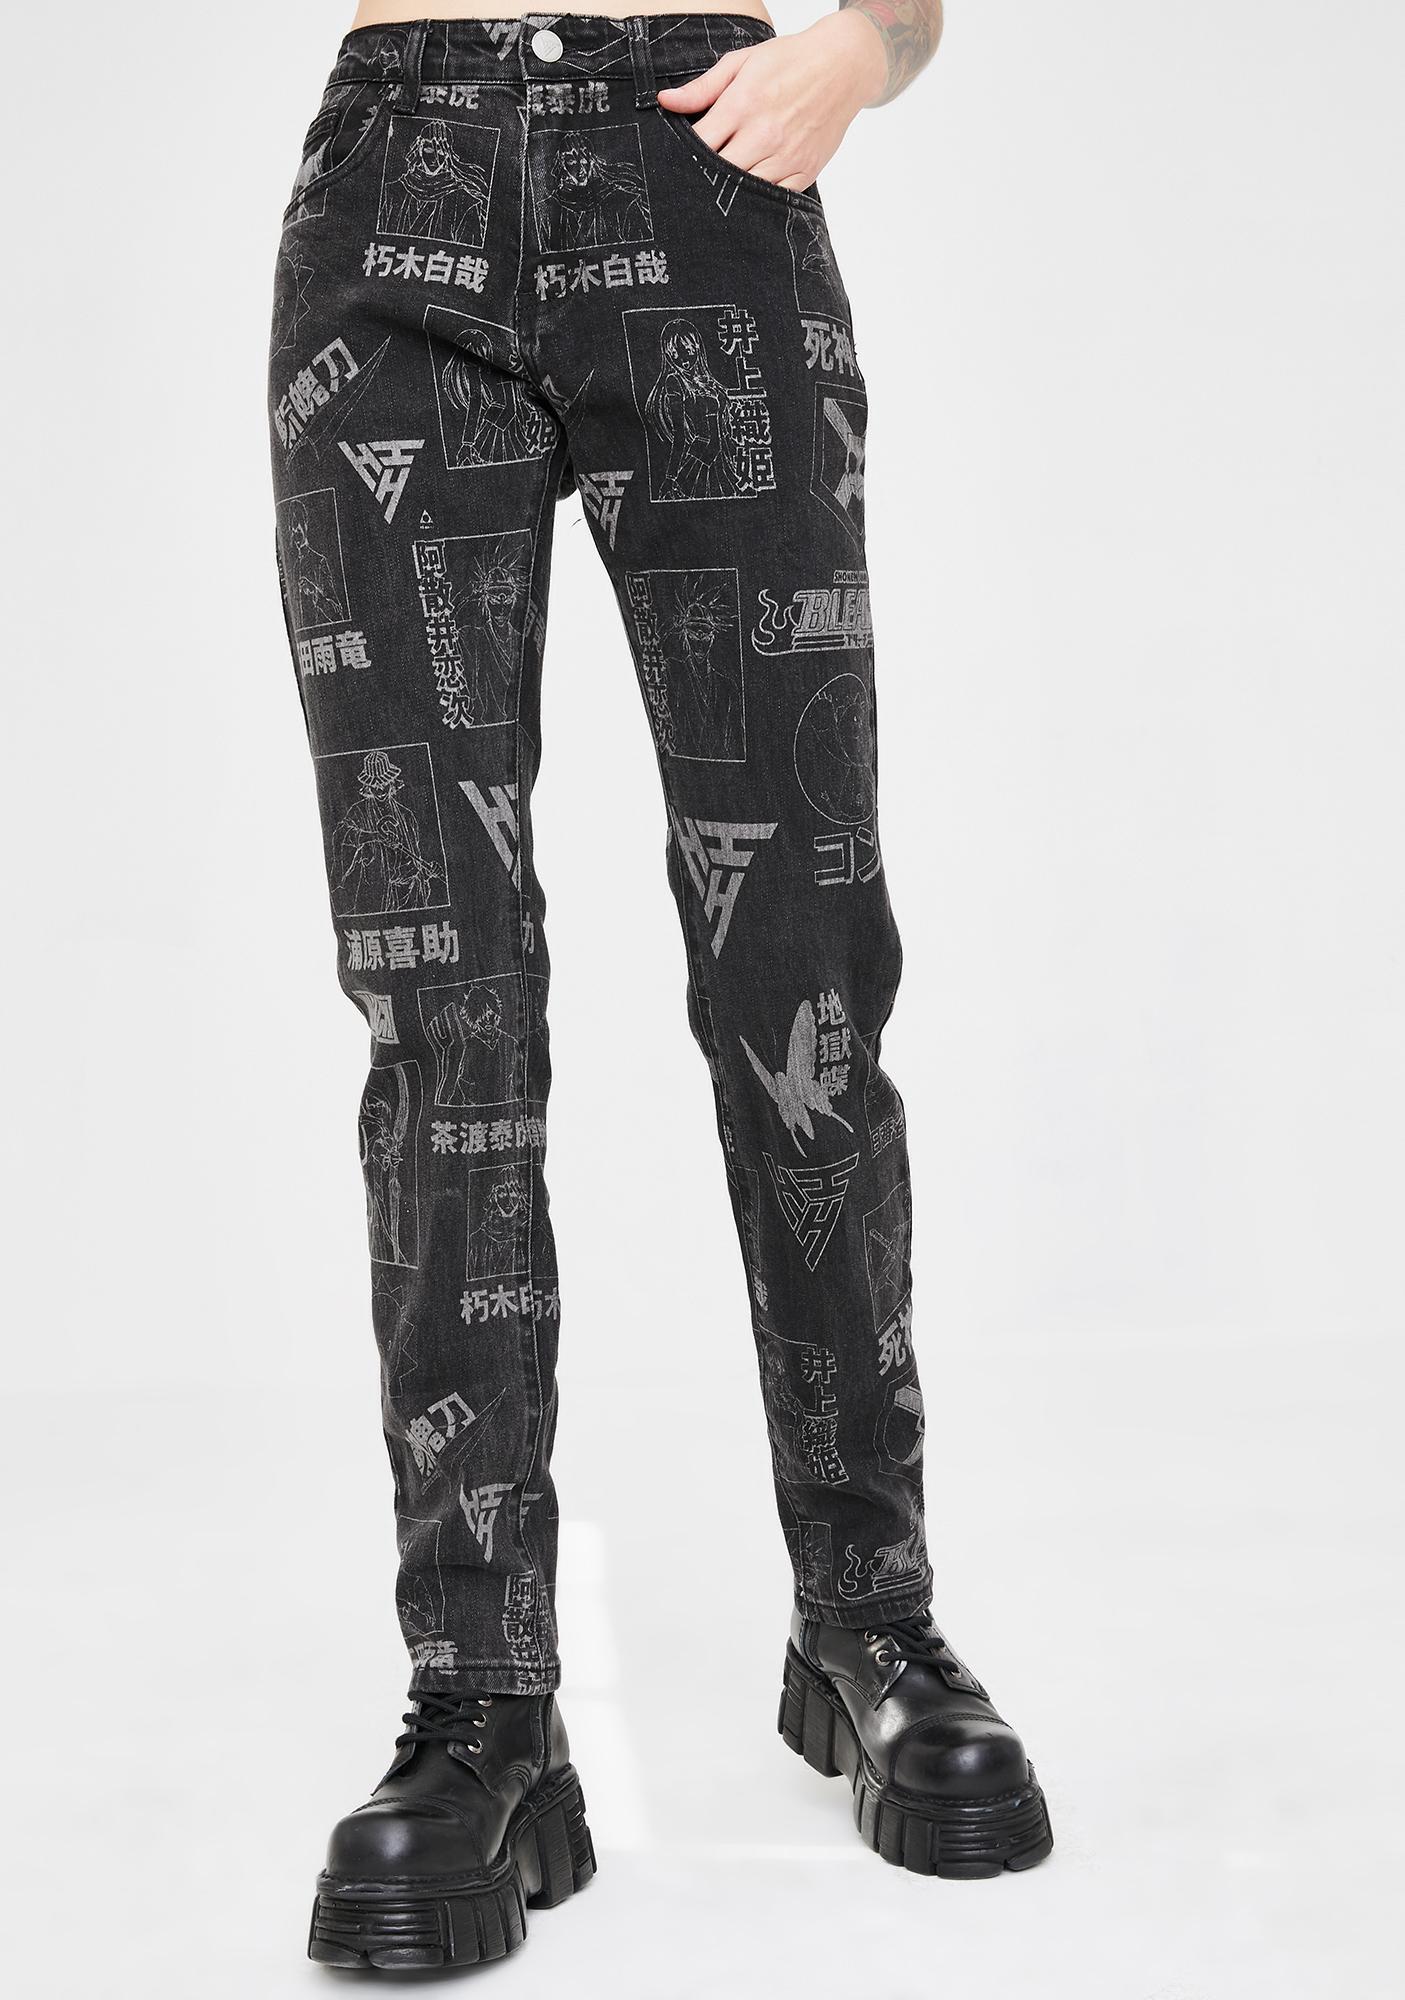 HYPLAND X Bleach Denim Characters Jeans